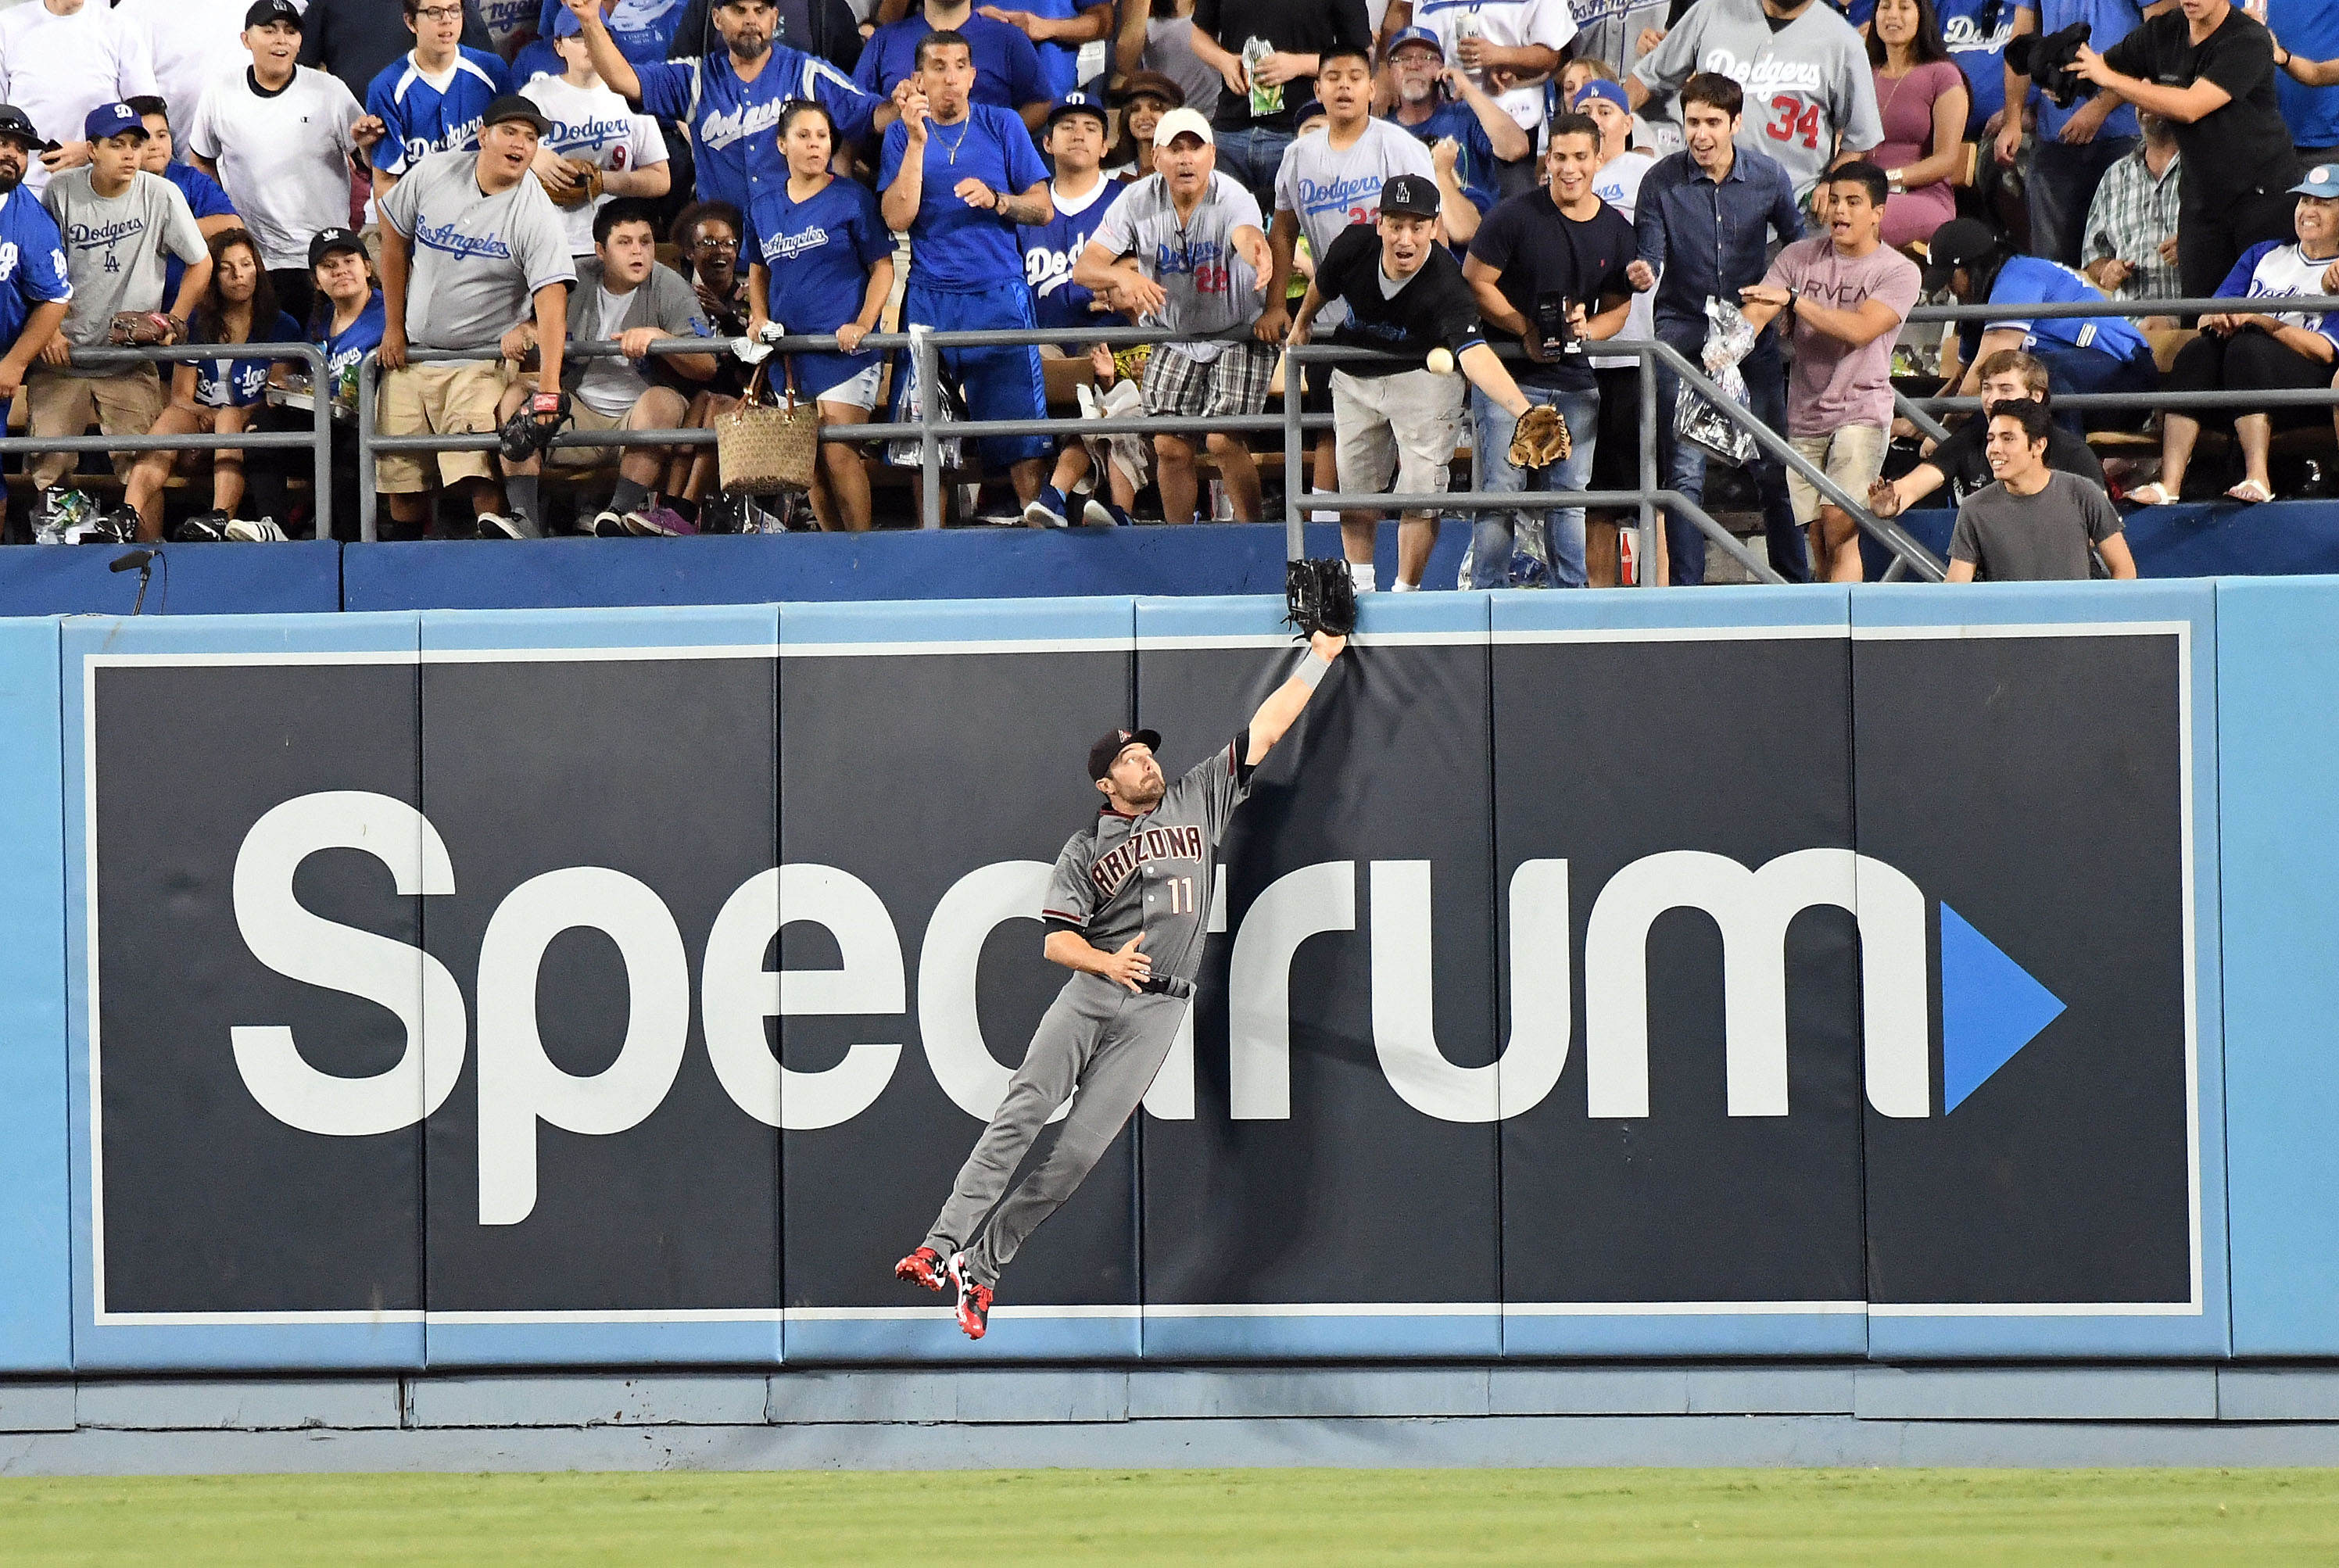 True Blue La A Los Angeles Dodgers Community